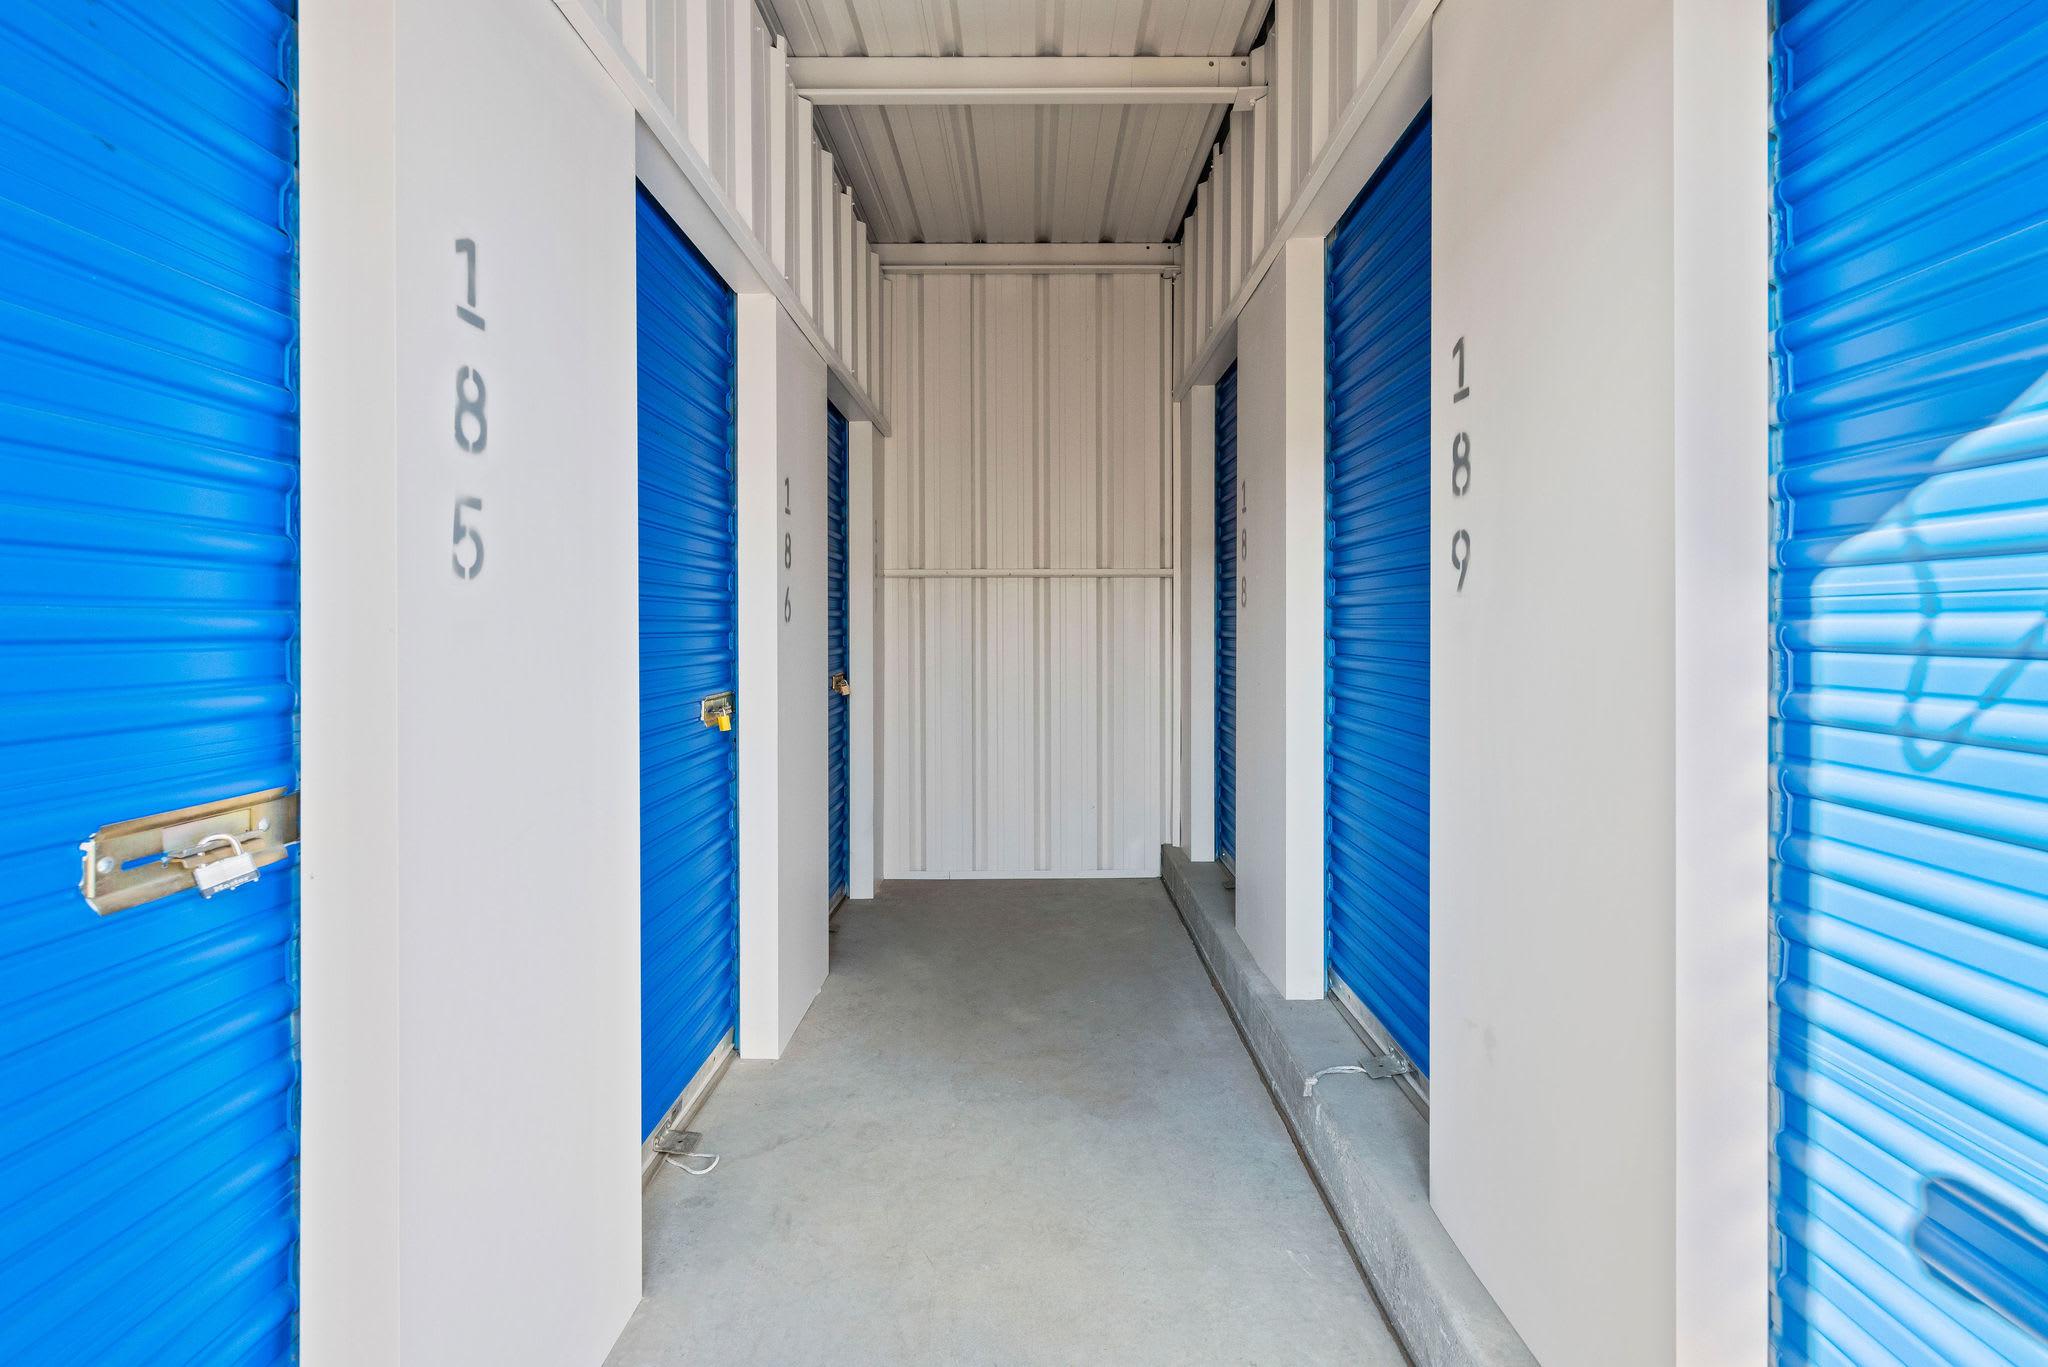 Walk up storage at Stor'em Self Storage in Orem, Utah